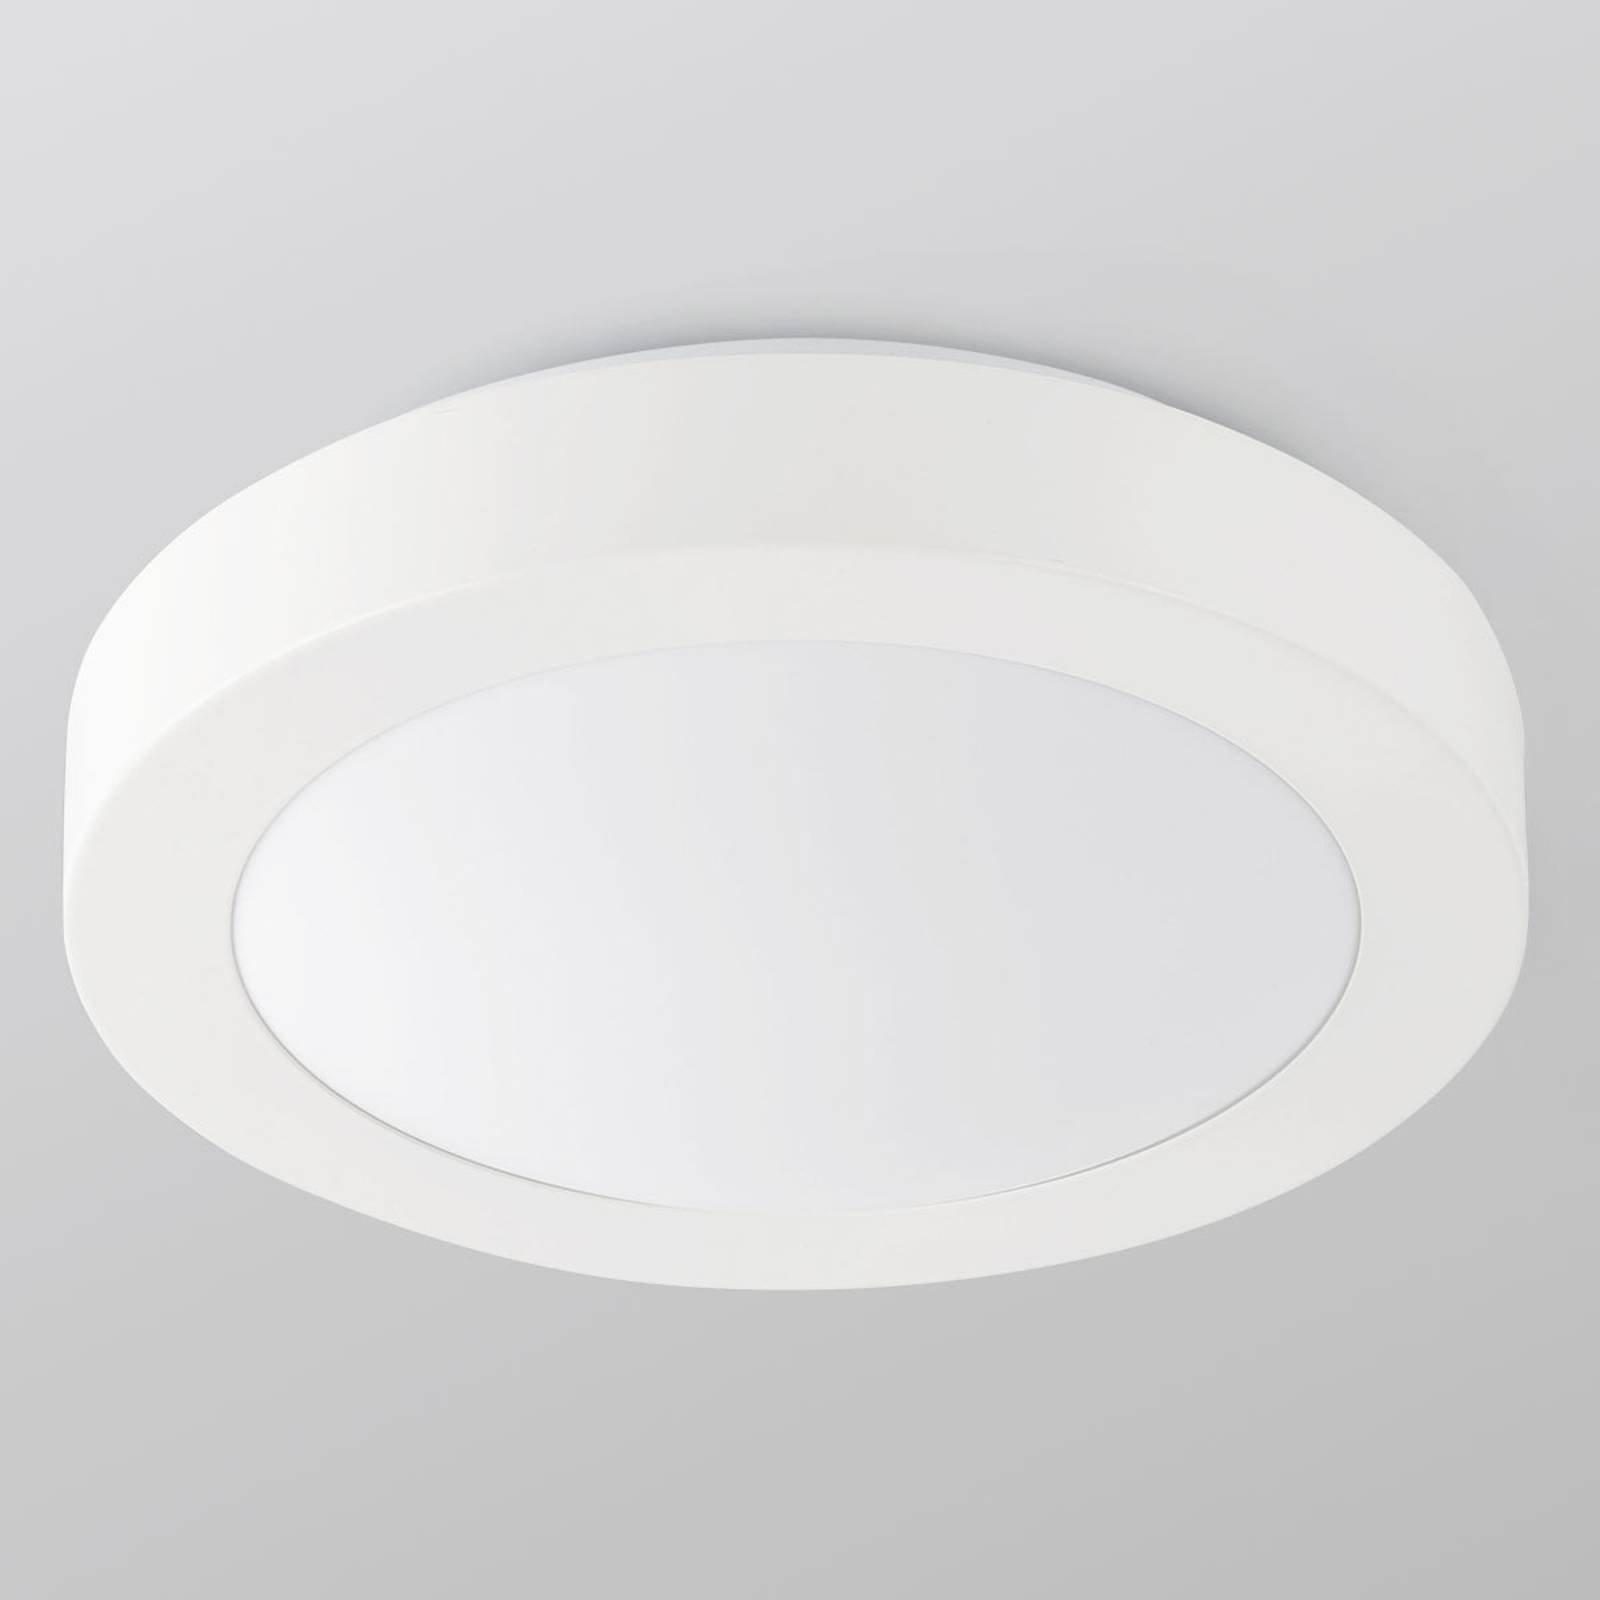 Logos - rund taklampe for baderom Ø 35 cm